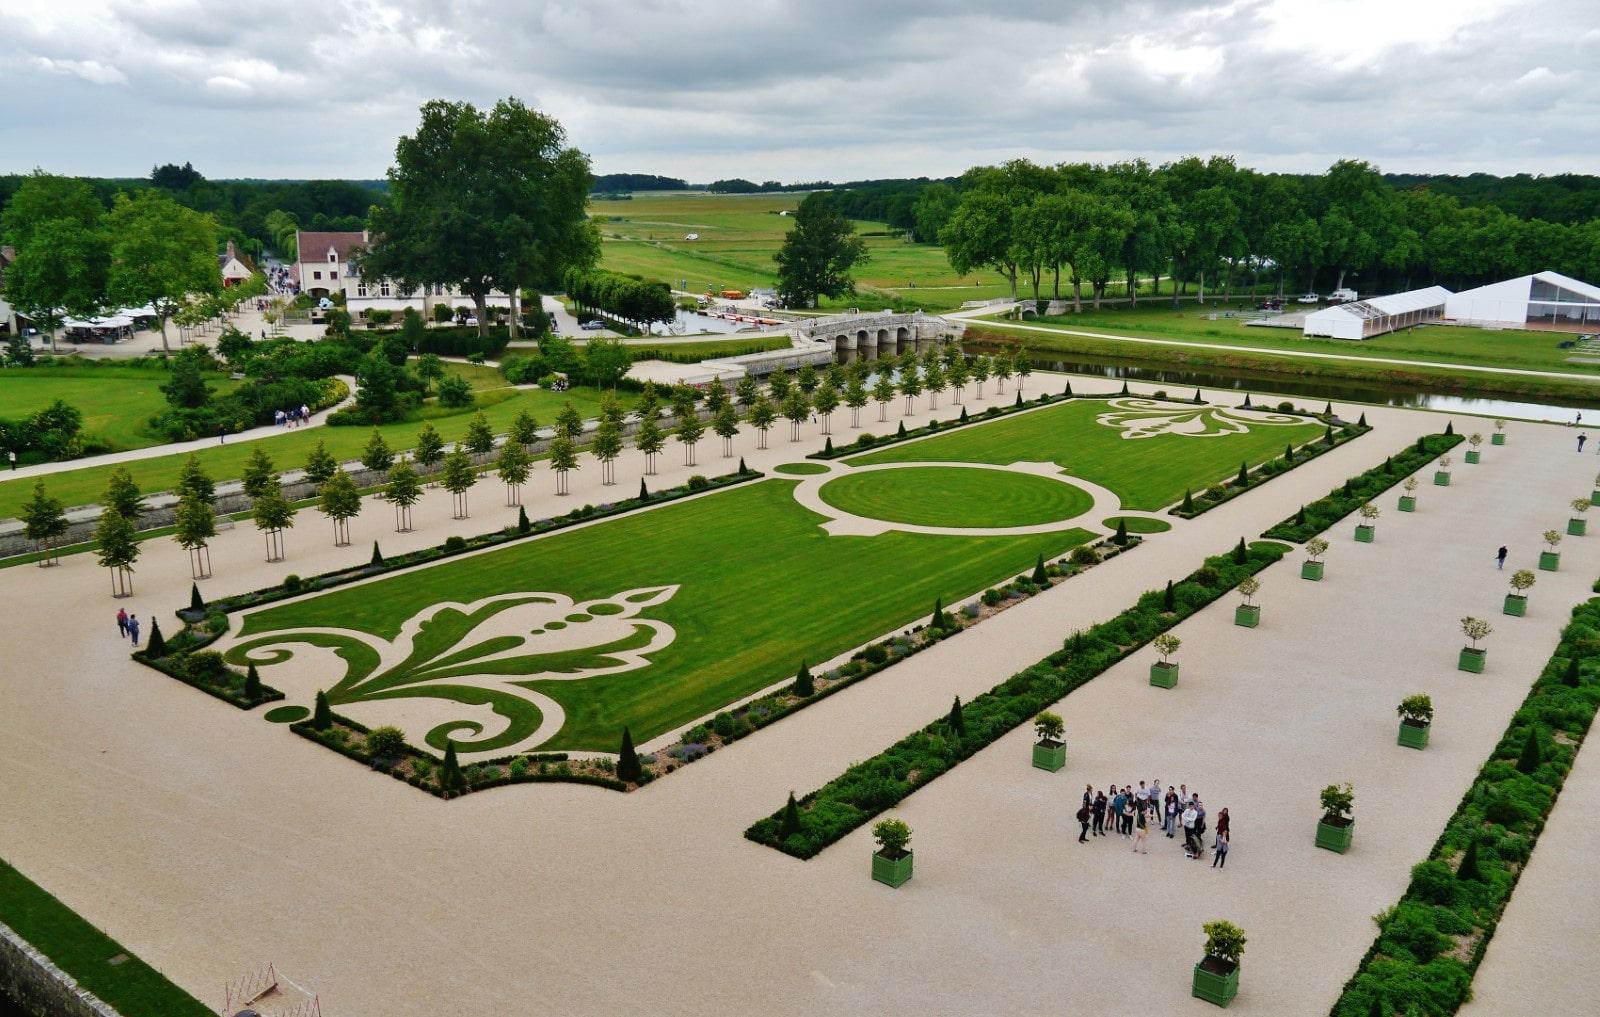 giardini alla francese